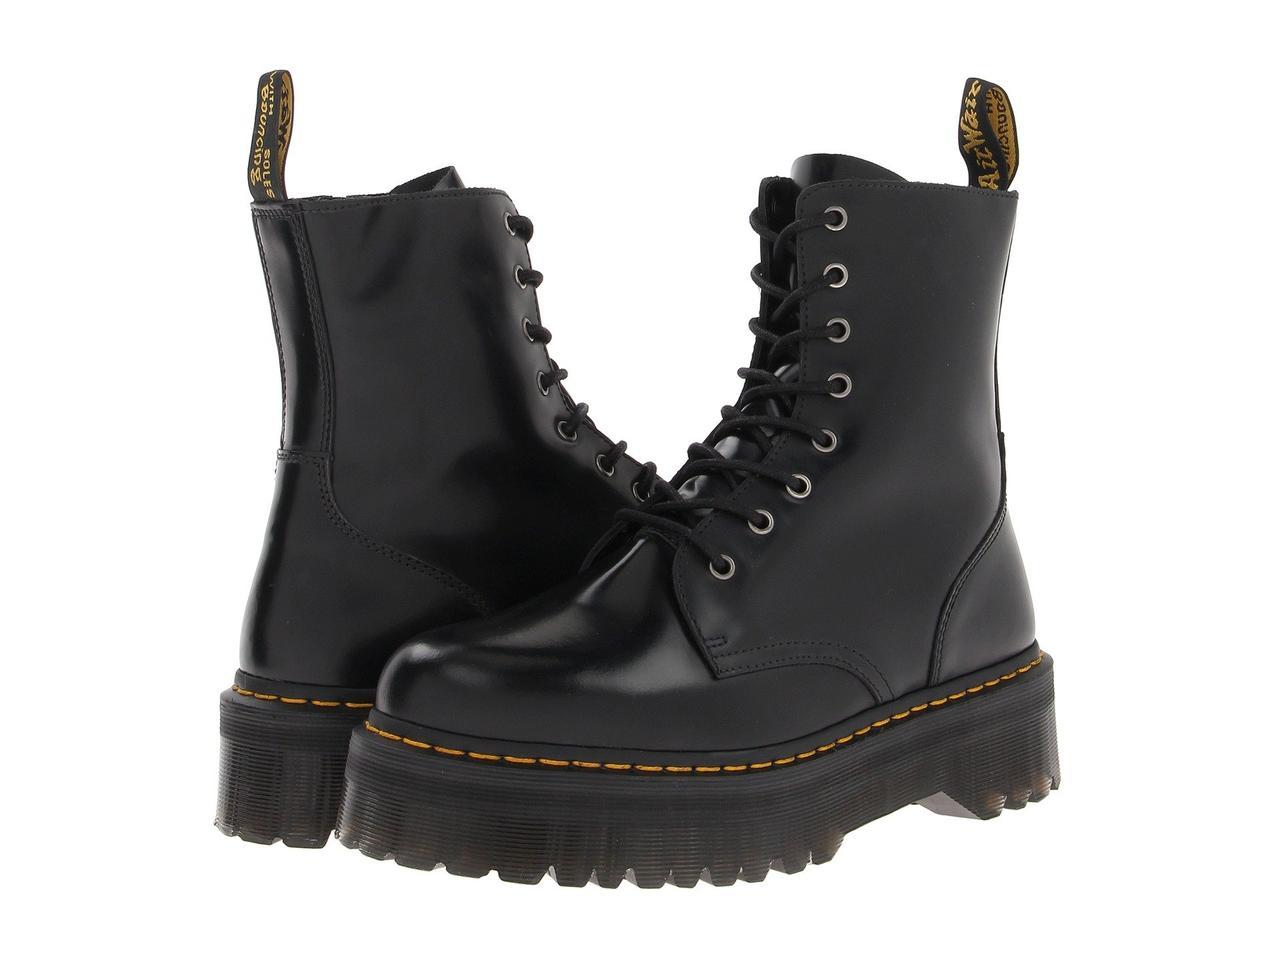 260c6253 Ботинки/Сапоги (Оригинал) Dr. Martens Jadon 8-Eye Boot Black Polished